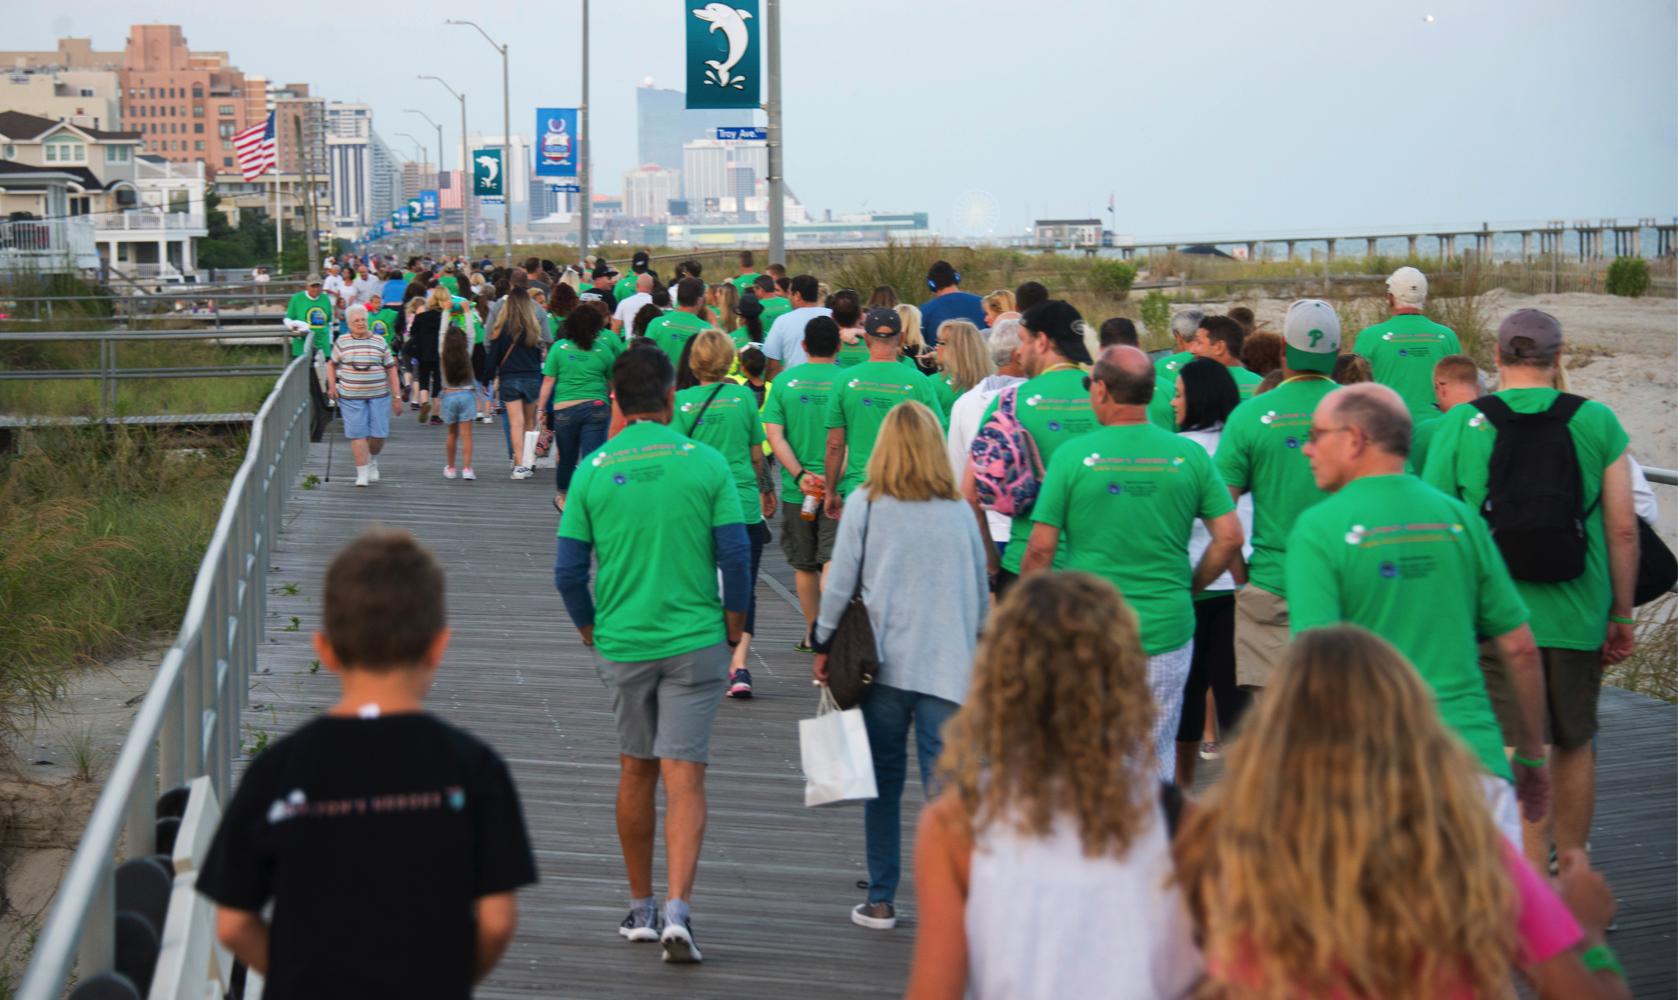 A sea of green took over the Ventnor boardwalk!